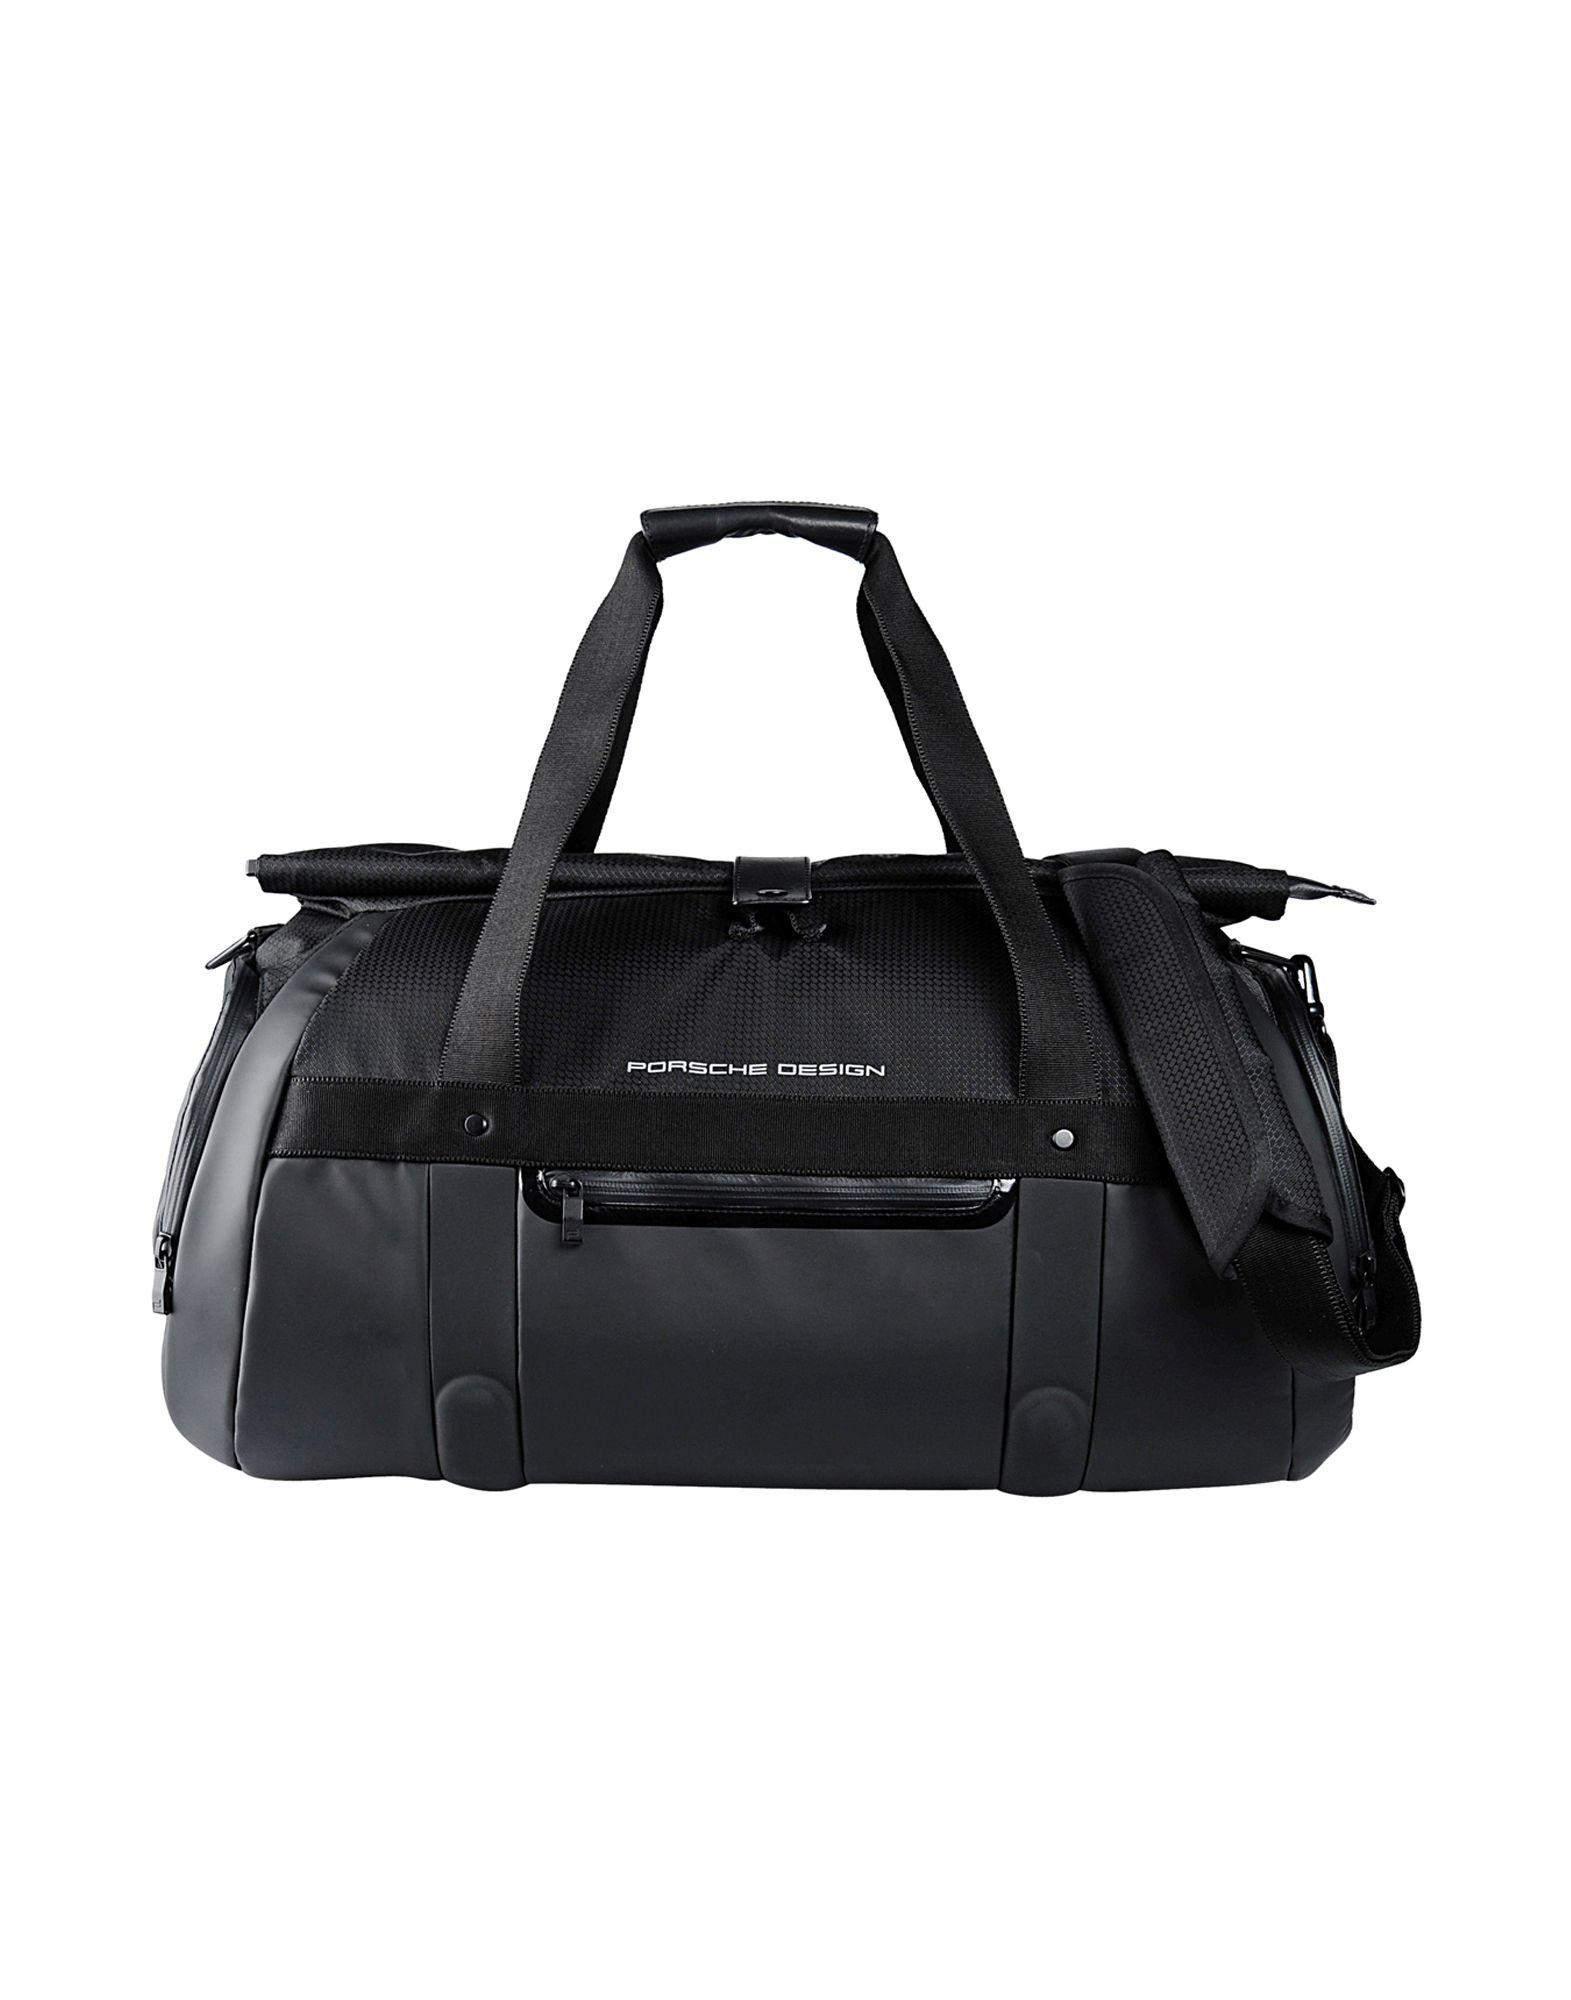 750b654afcbb ... Porsche Design Travel Duffel Bag in Black for Men - Lyst official  photos 489e8 639f5 ...